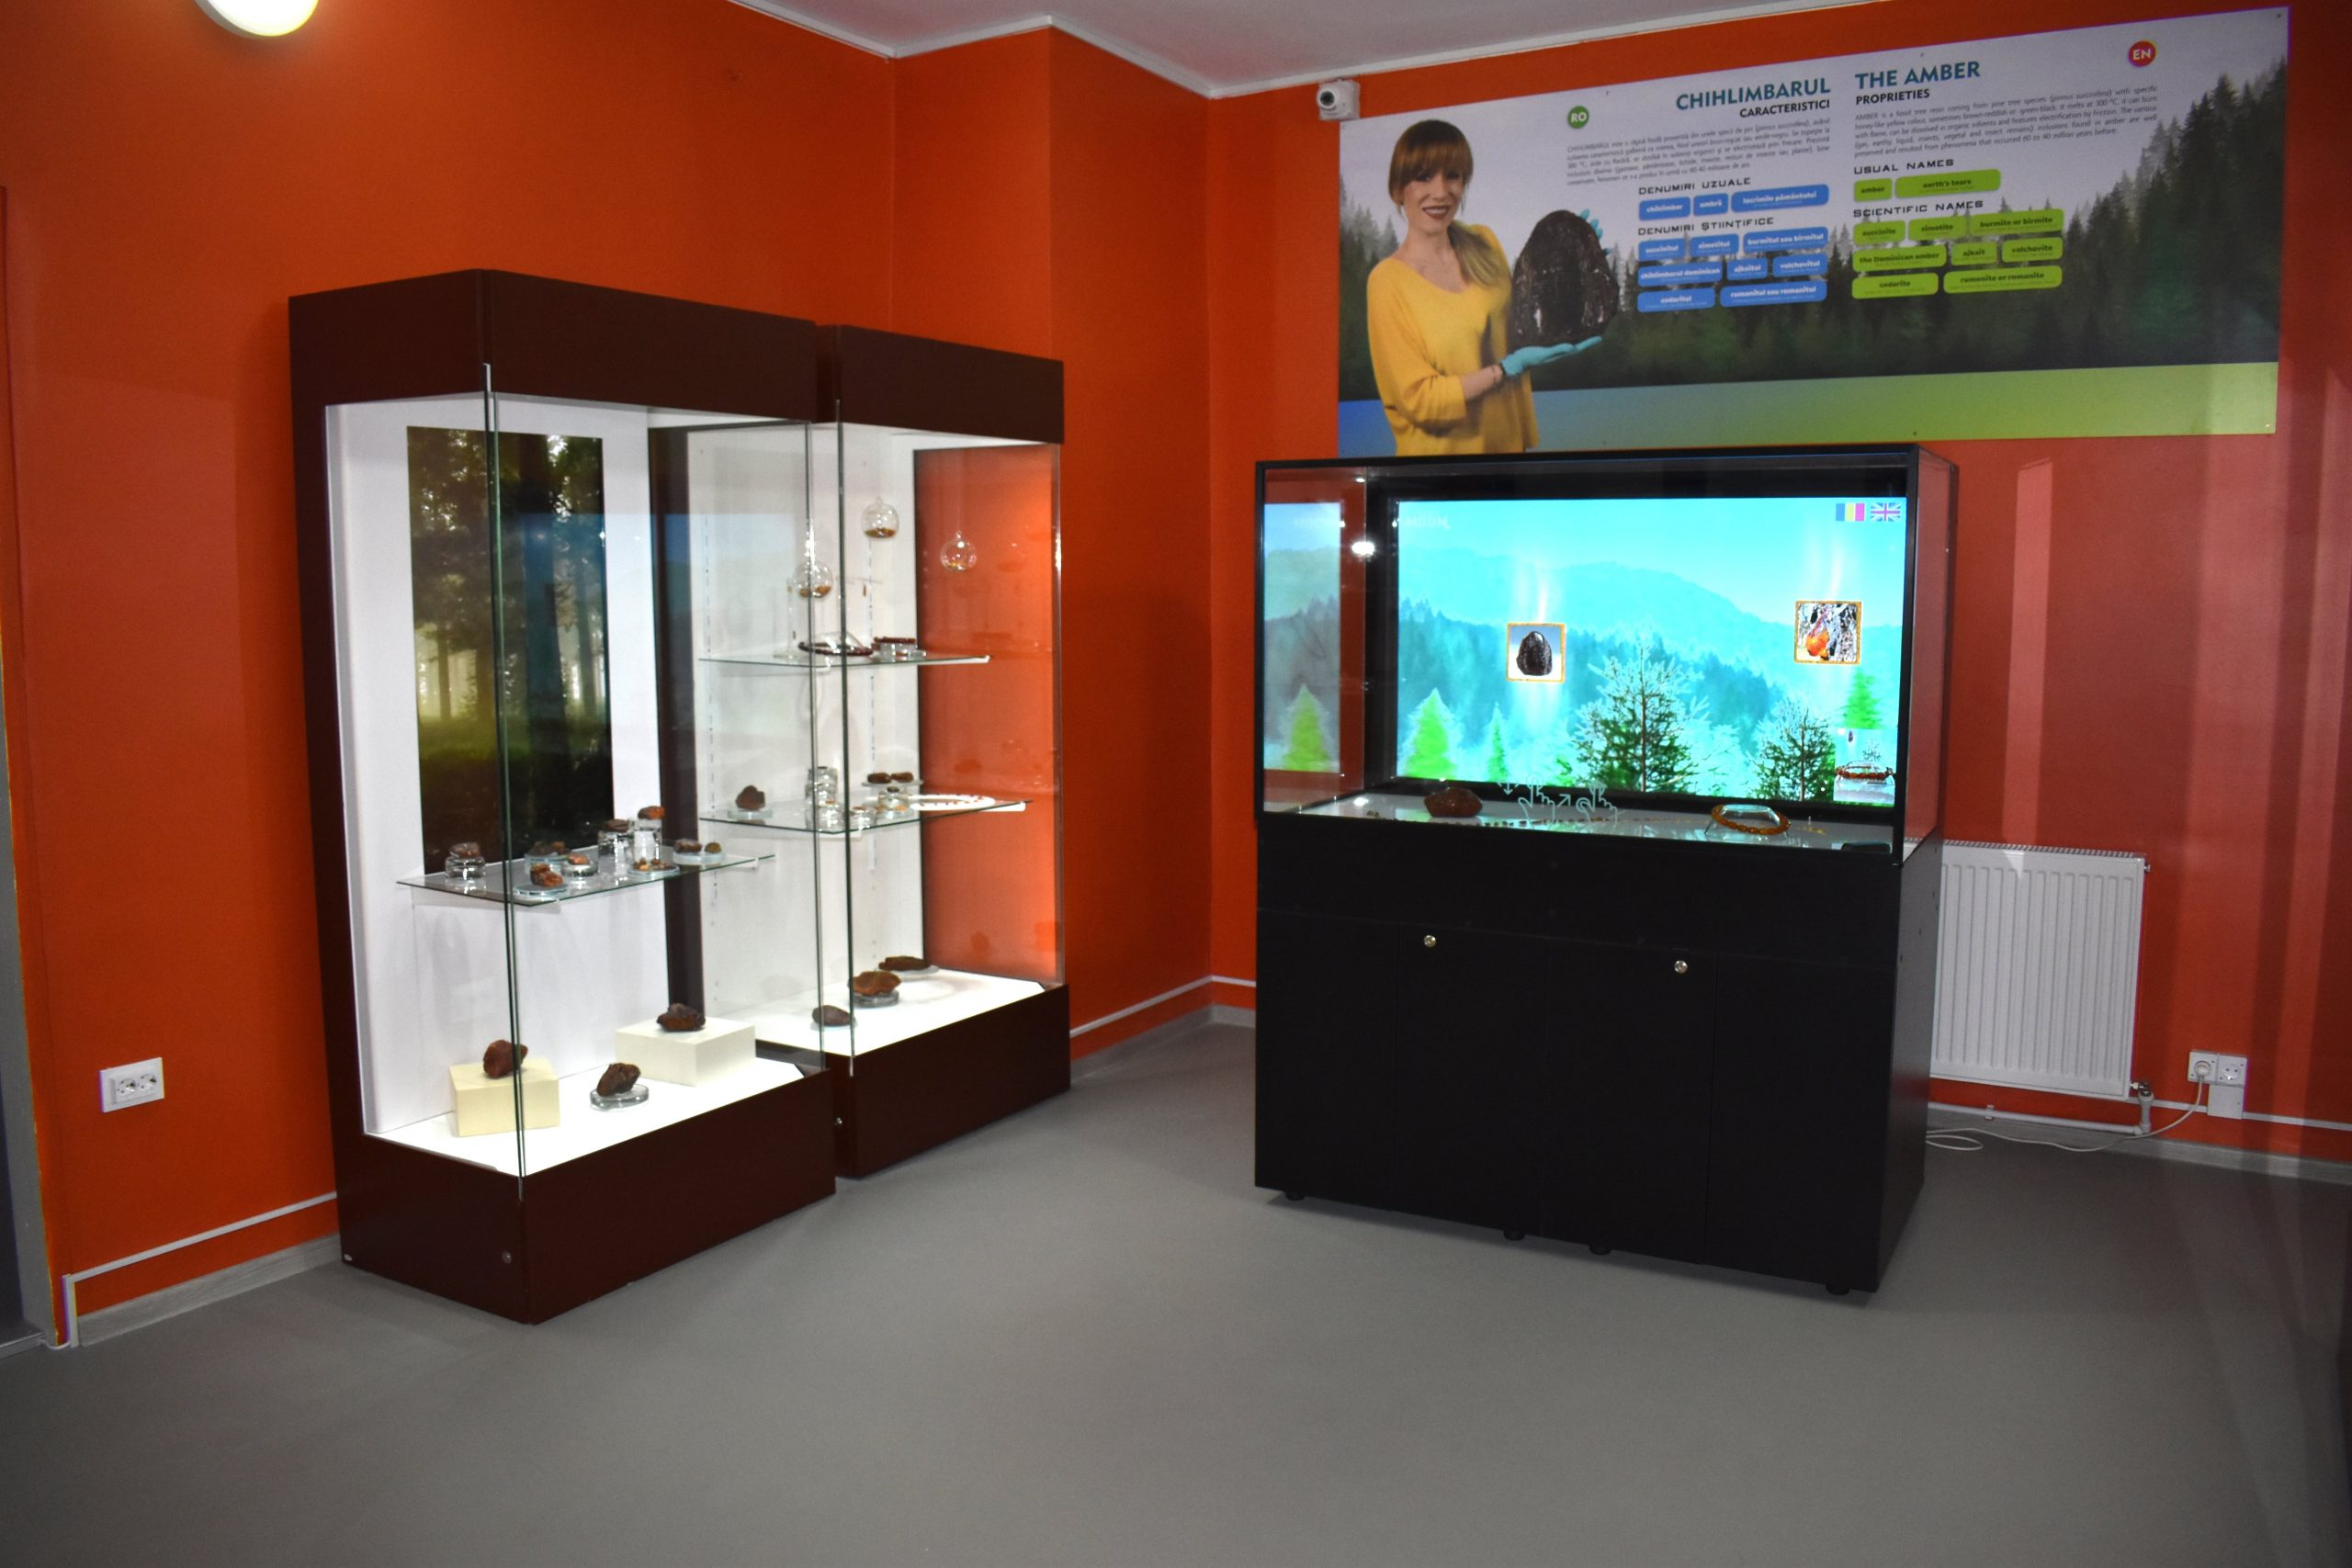 Muzeul Chihlimbarului Colti